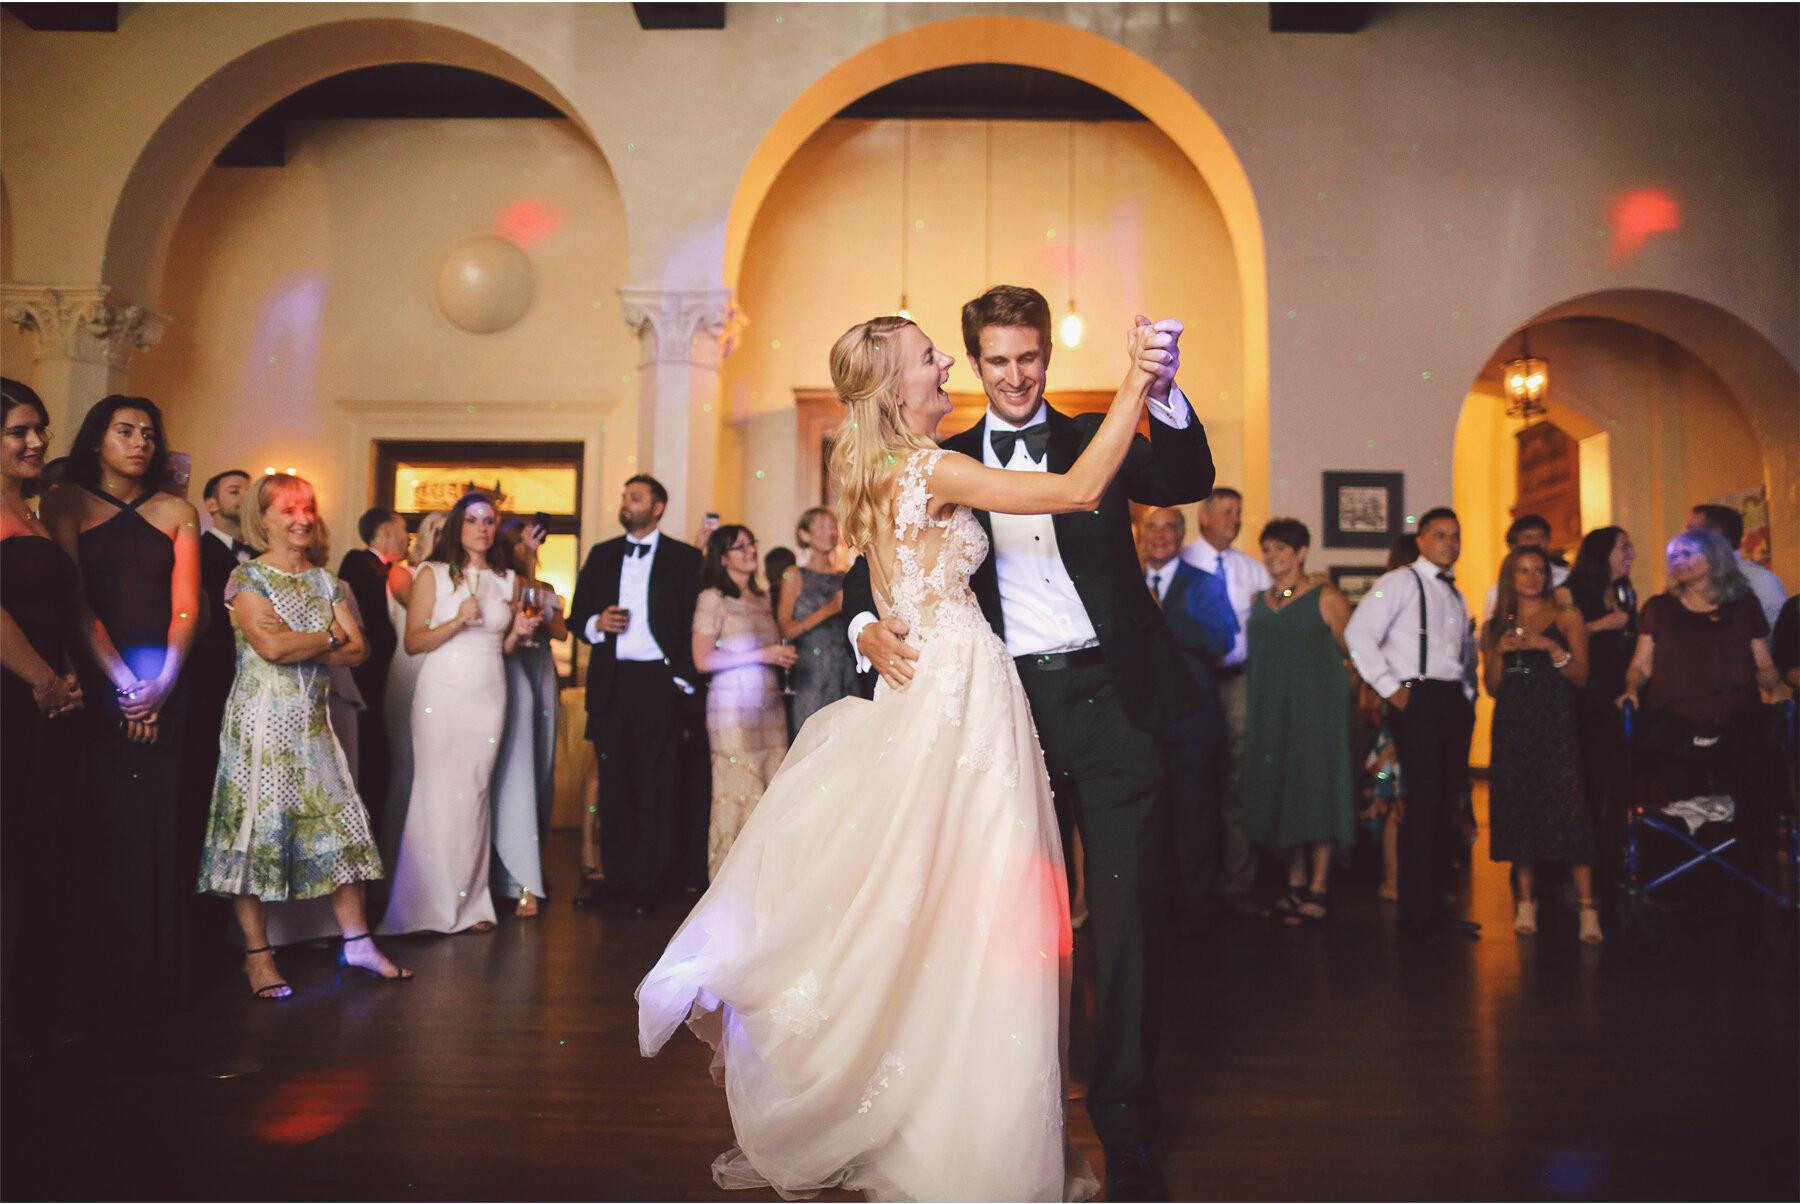 22 Wedding Vick Photography Minneapolis Minnesota Reception Womens Club Dance Michelle and William.jpg